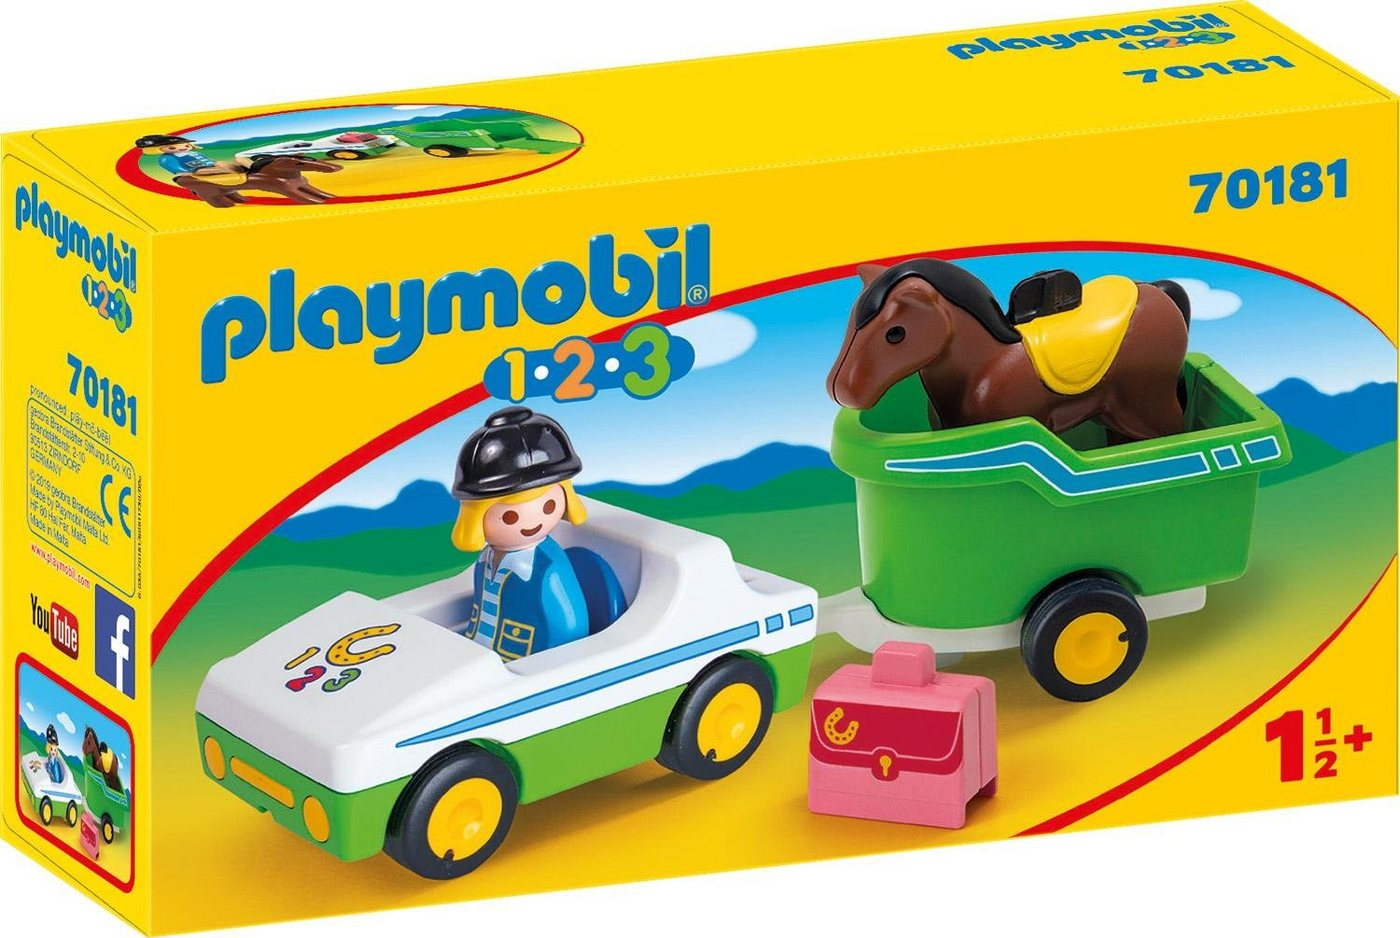 Playmobil® PKW mit Pferdeanhänger (70181), »Playmobil 1-2-3«